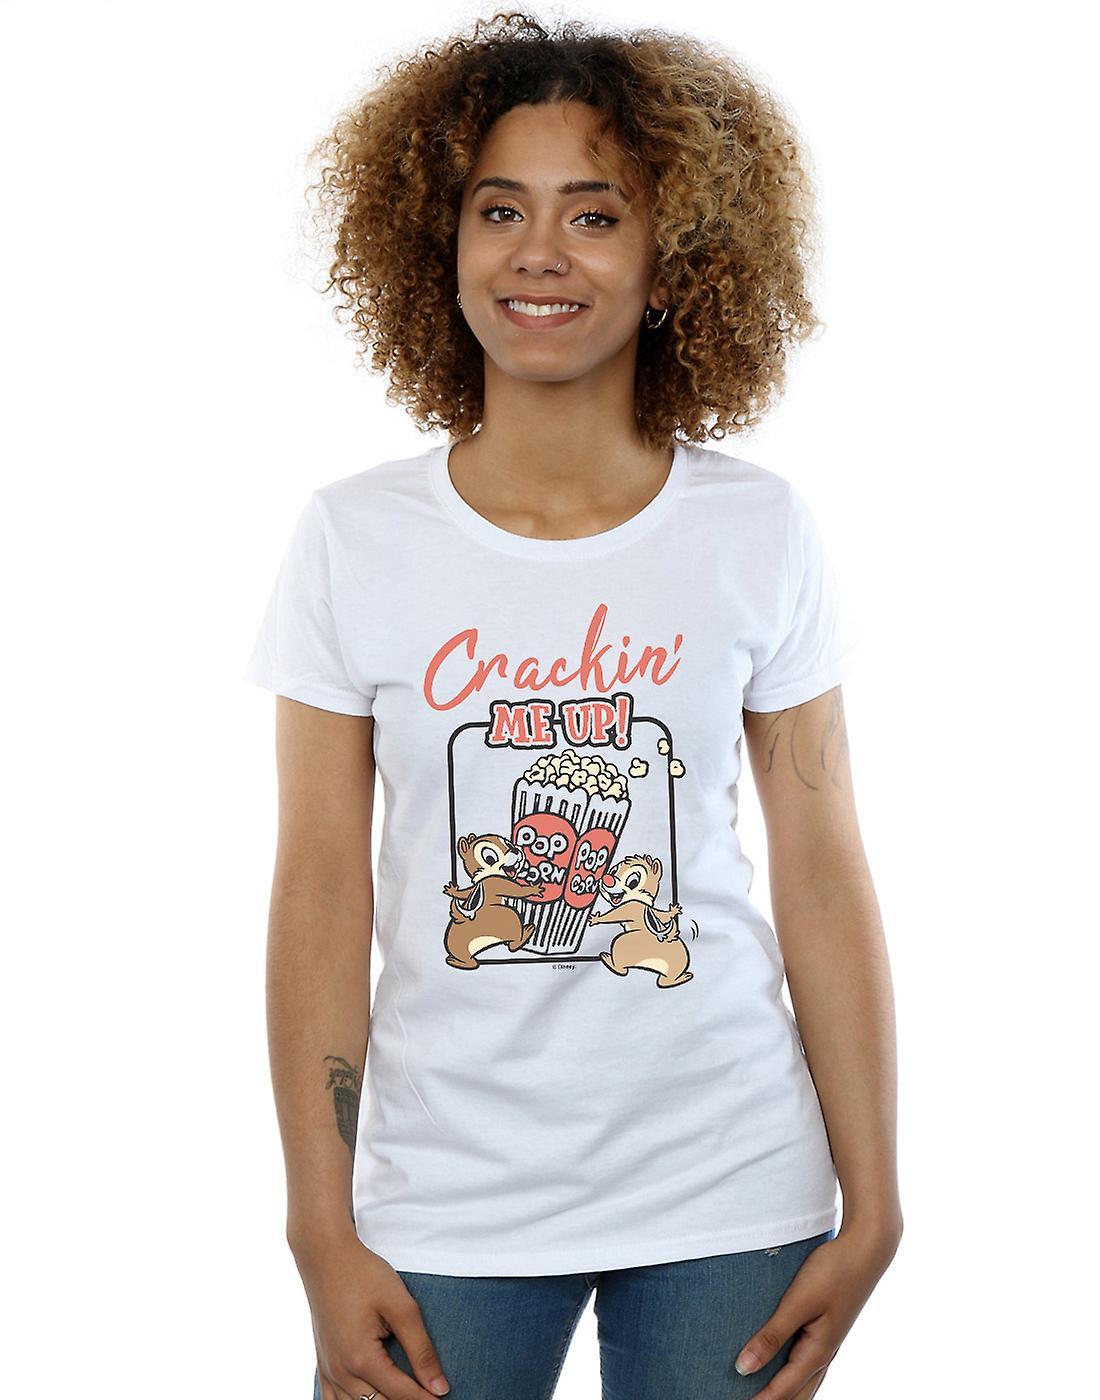 Disney Women's Chip N Dale Crackin Me Up T-Shirt